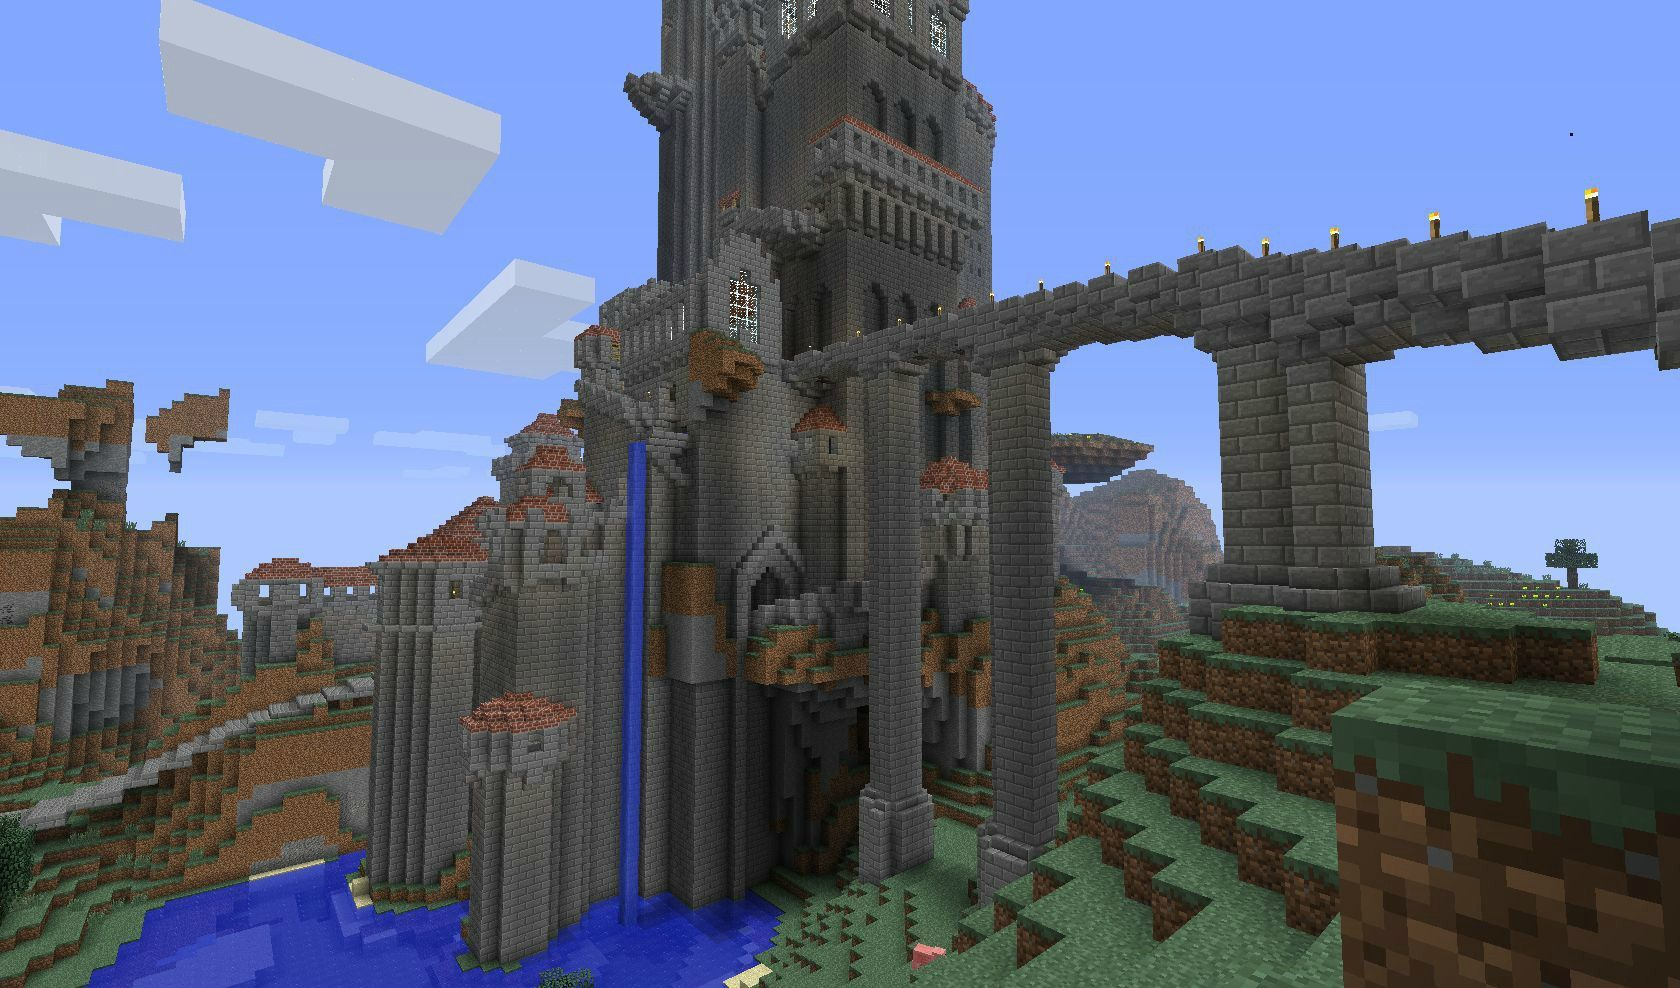 Charming Minecraft Castle Interior Decorating Ideas   Castle Design Ideas Minecraft  Blog Pictures